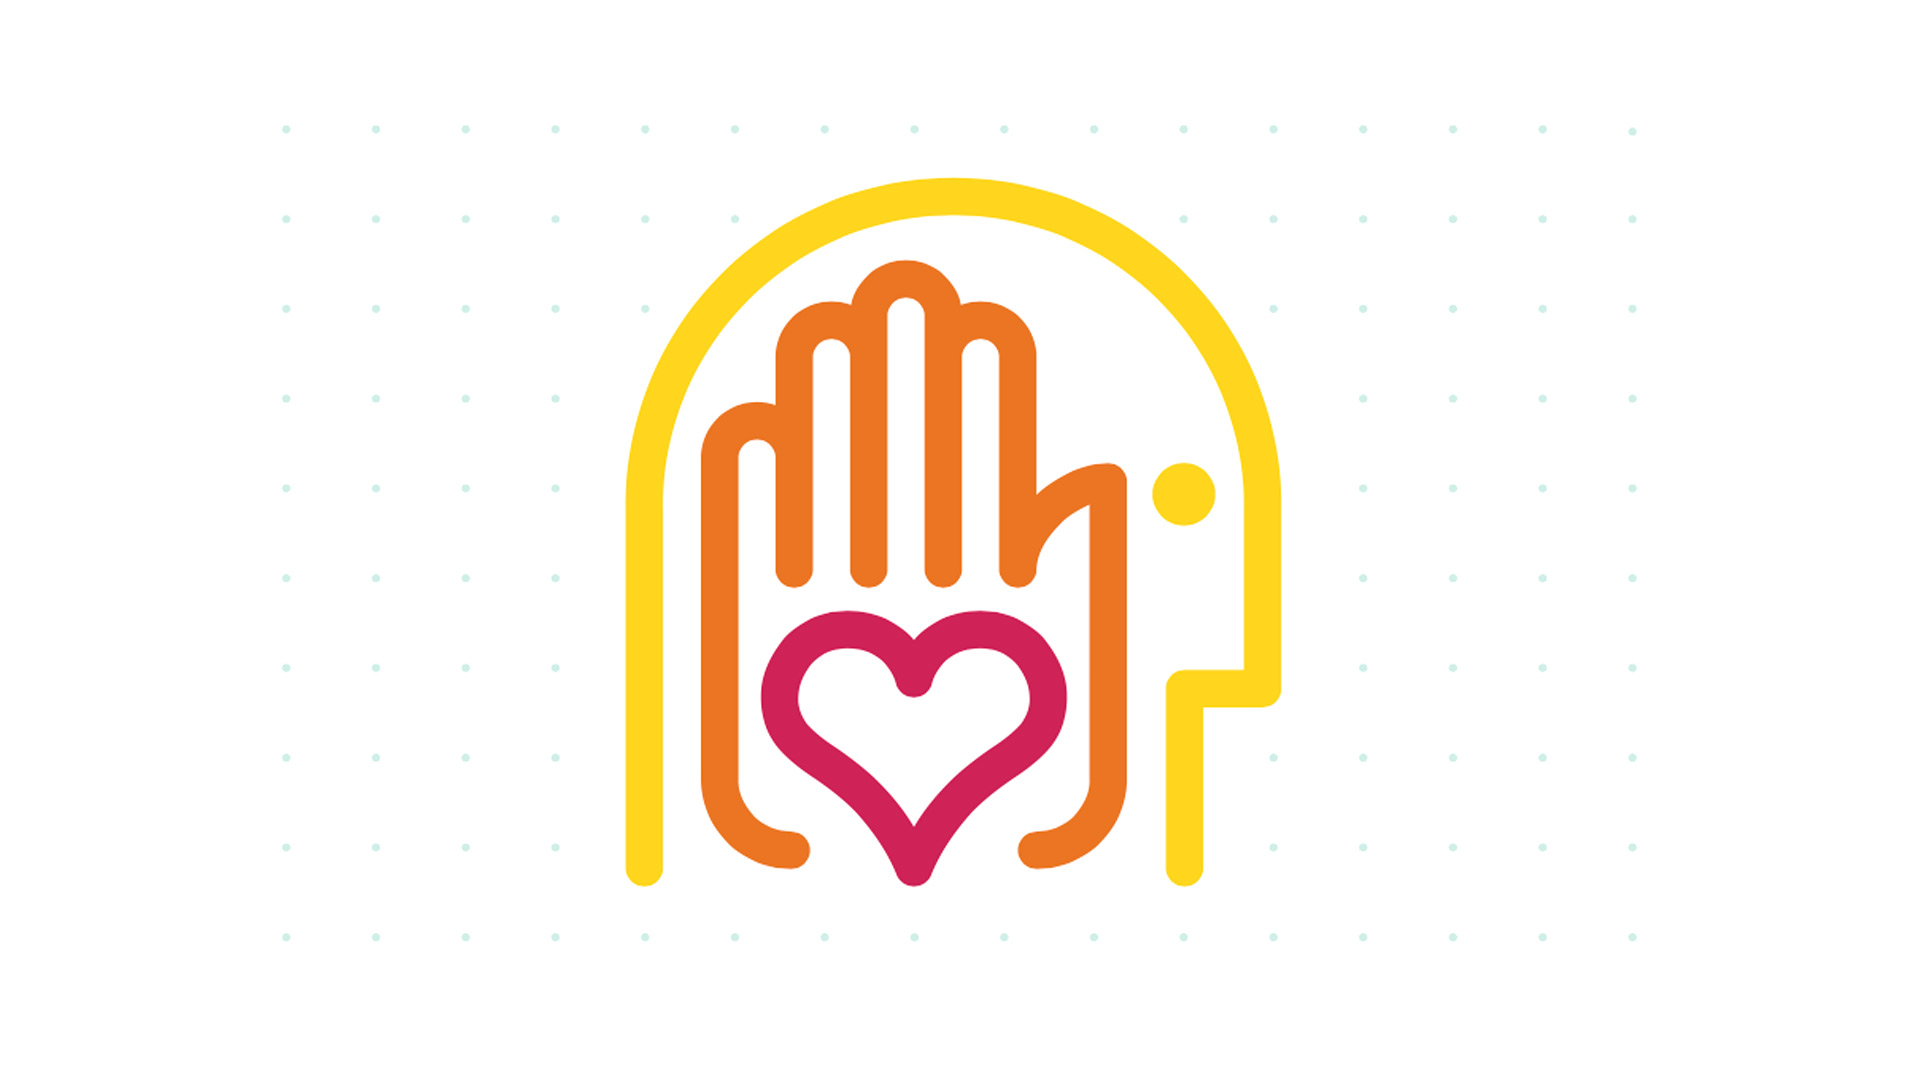 SCAD head, hand, heart logo